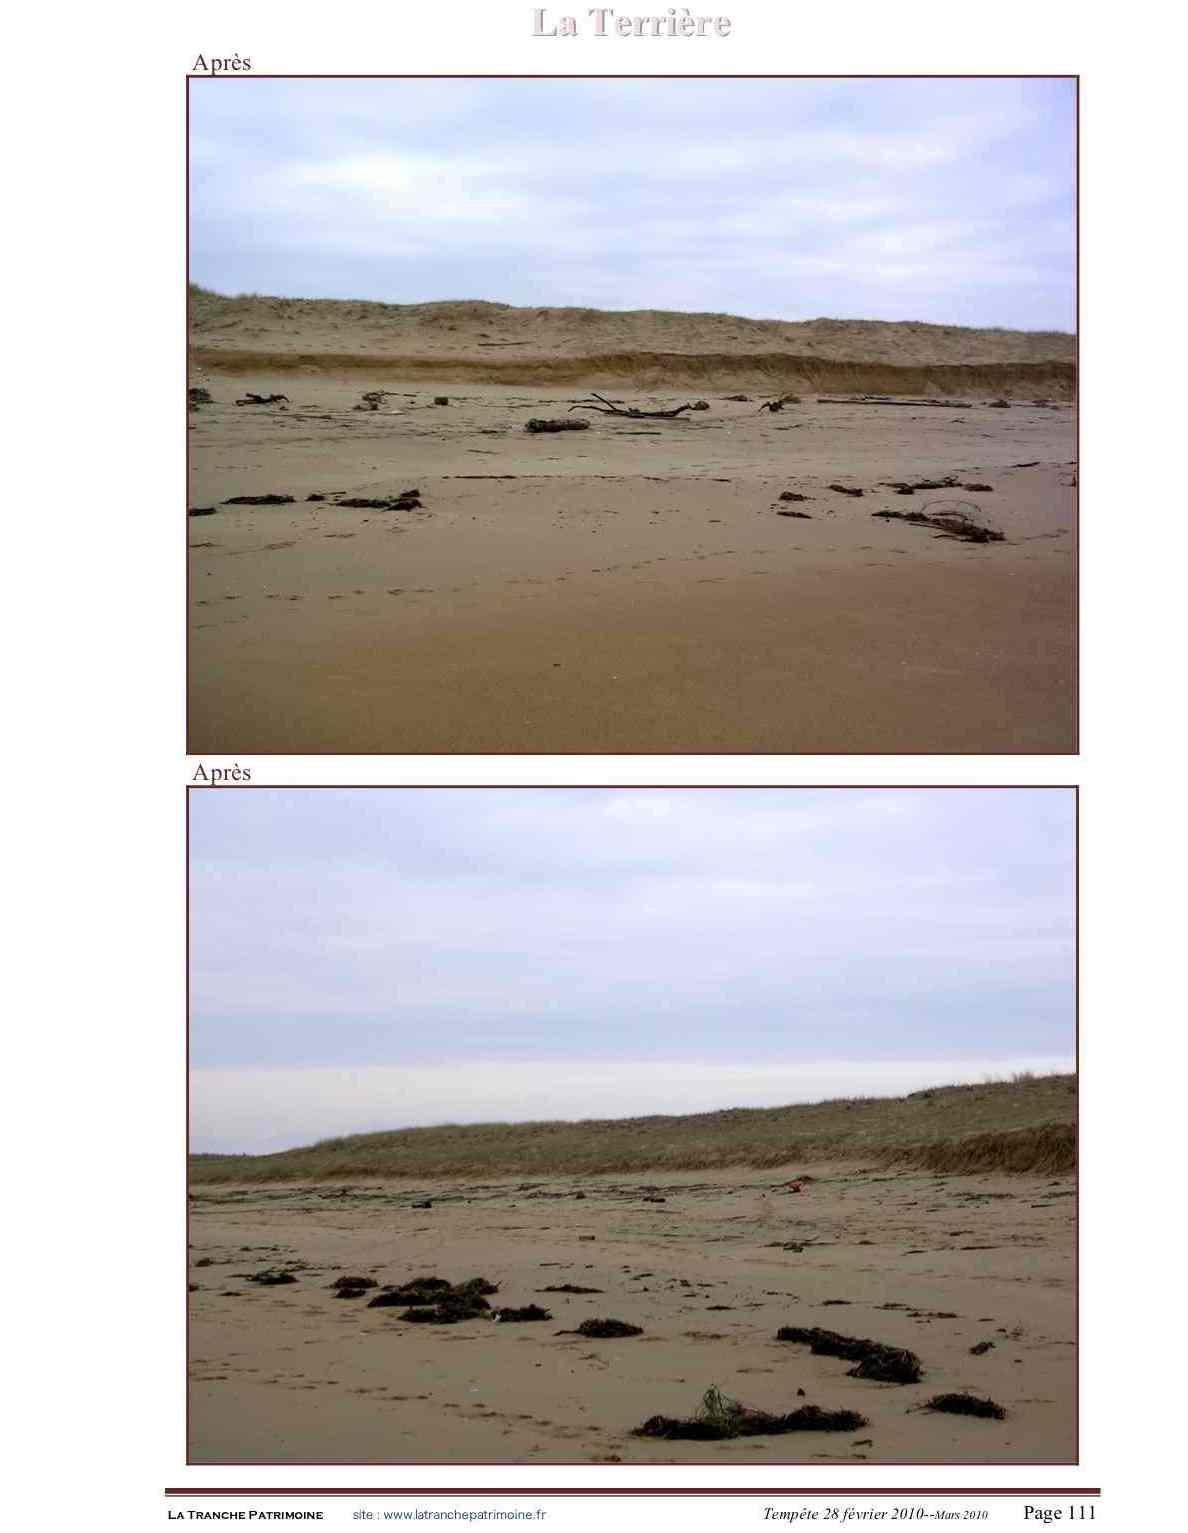 Tempete site JPEG 111 r.jpg